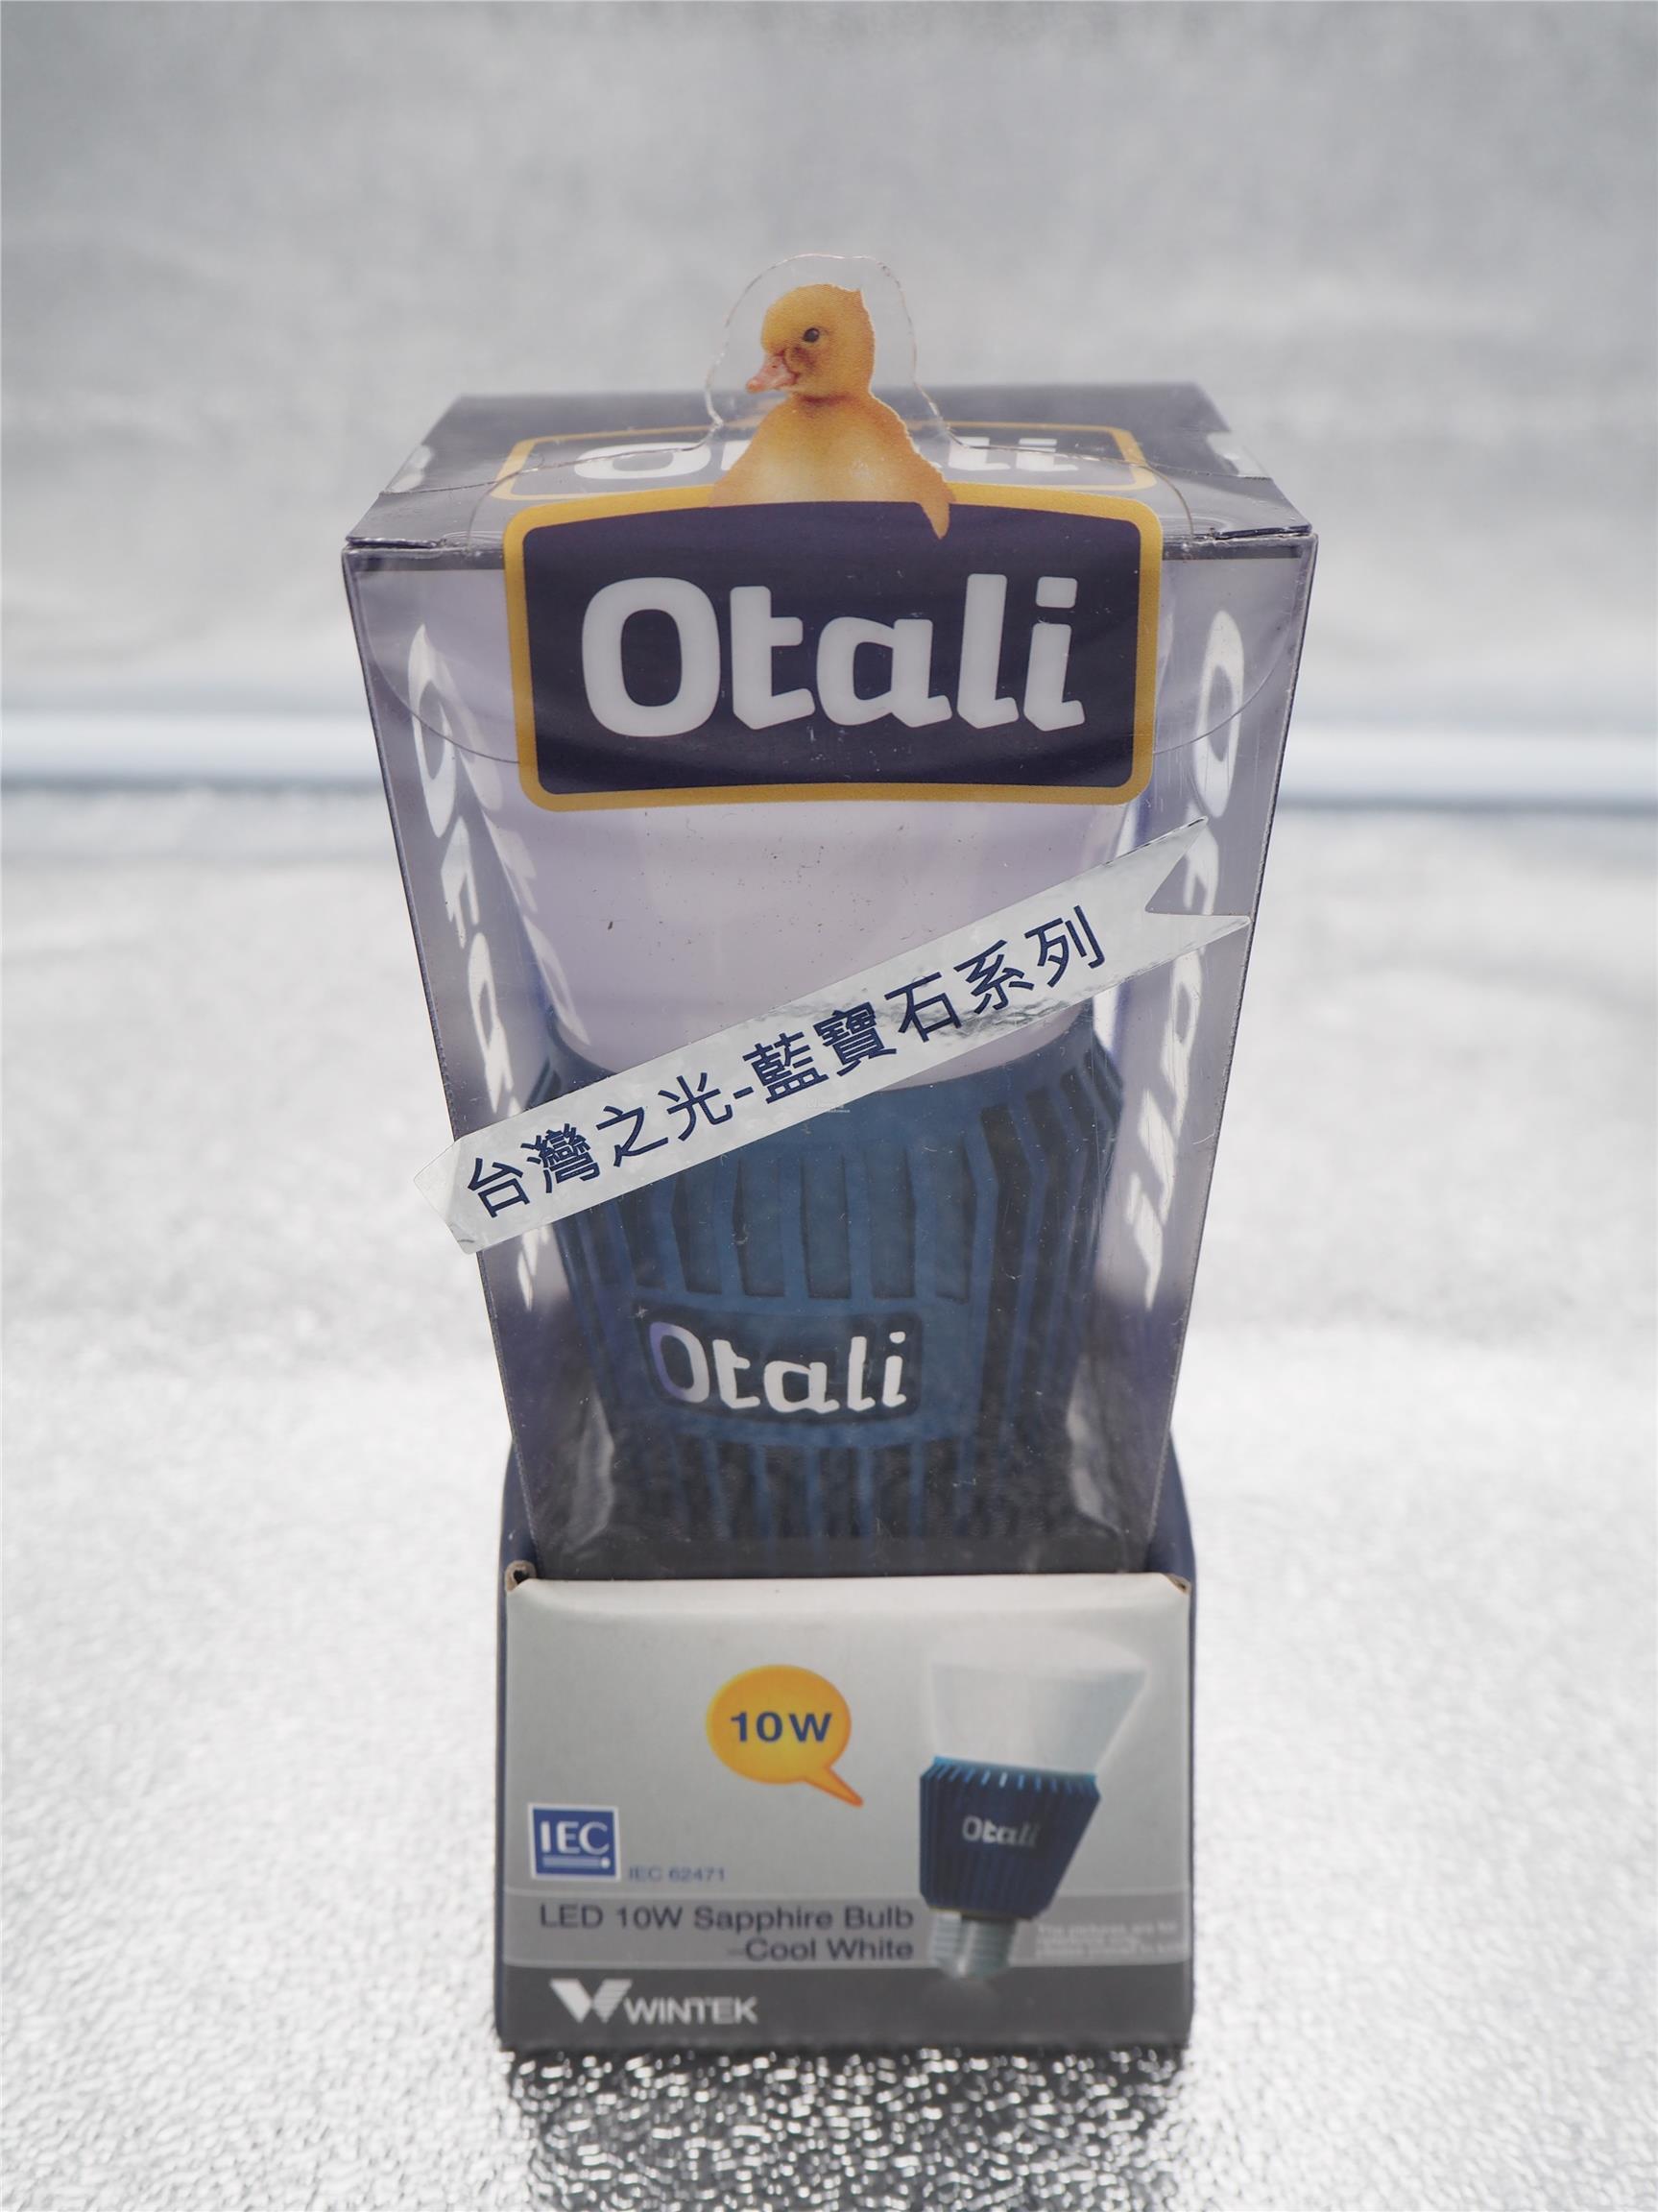 OTALI LED 10W SAPPHIRE BULB – COOL WHITE